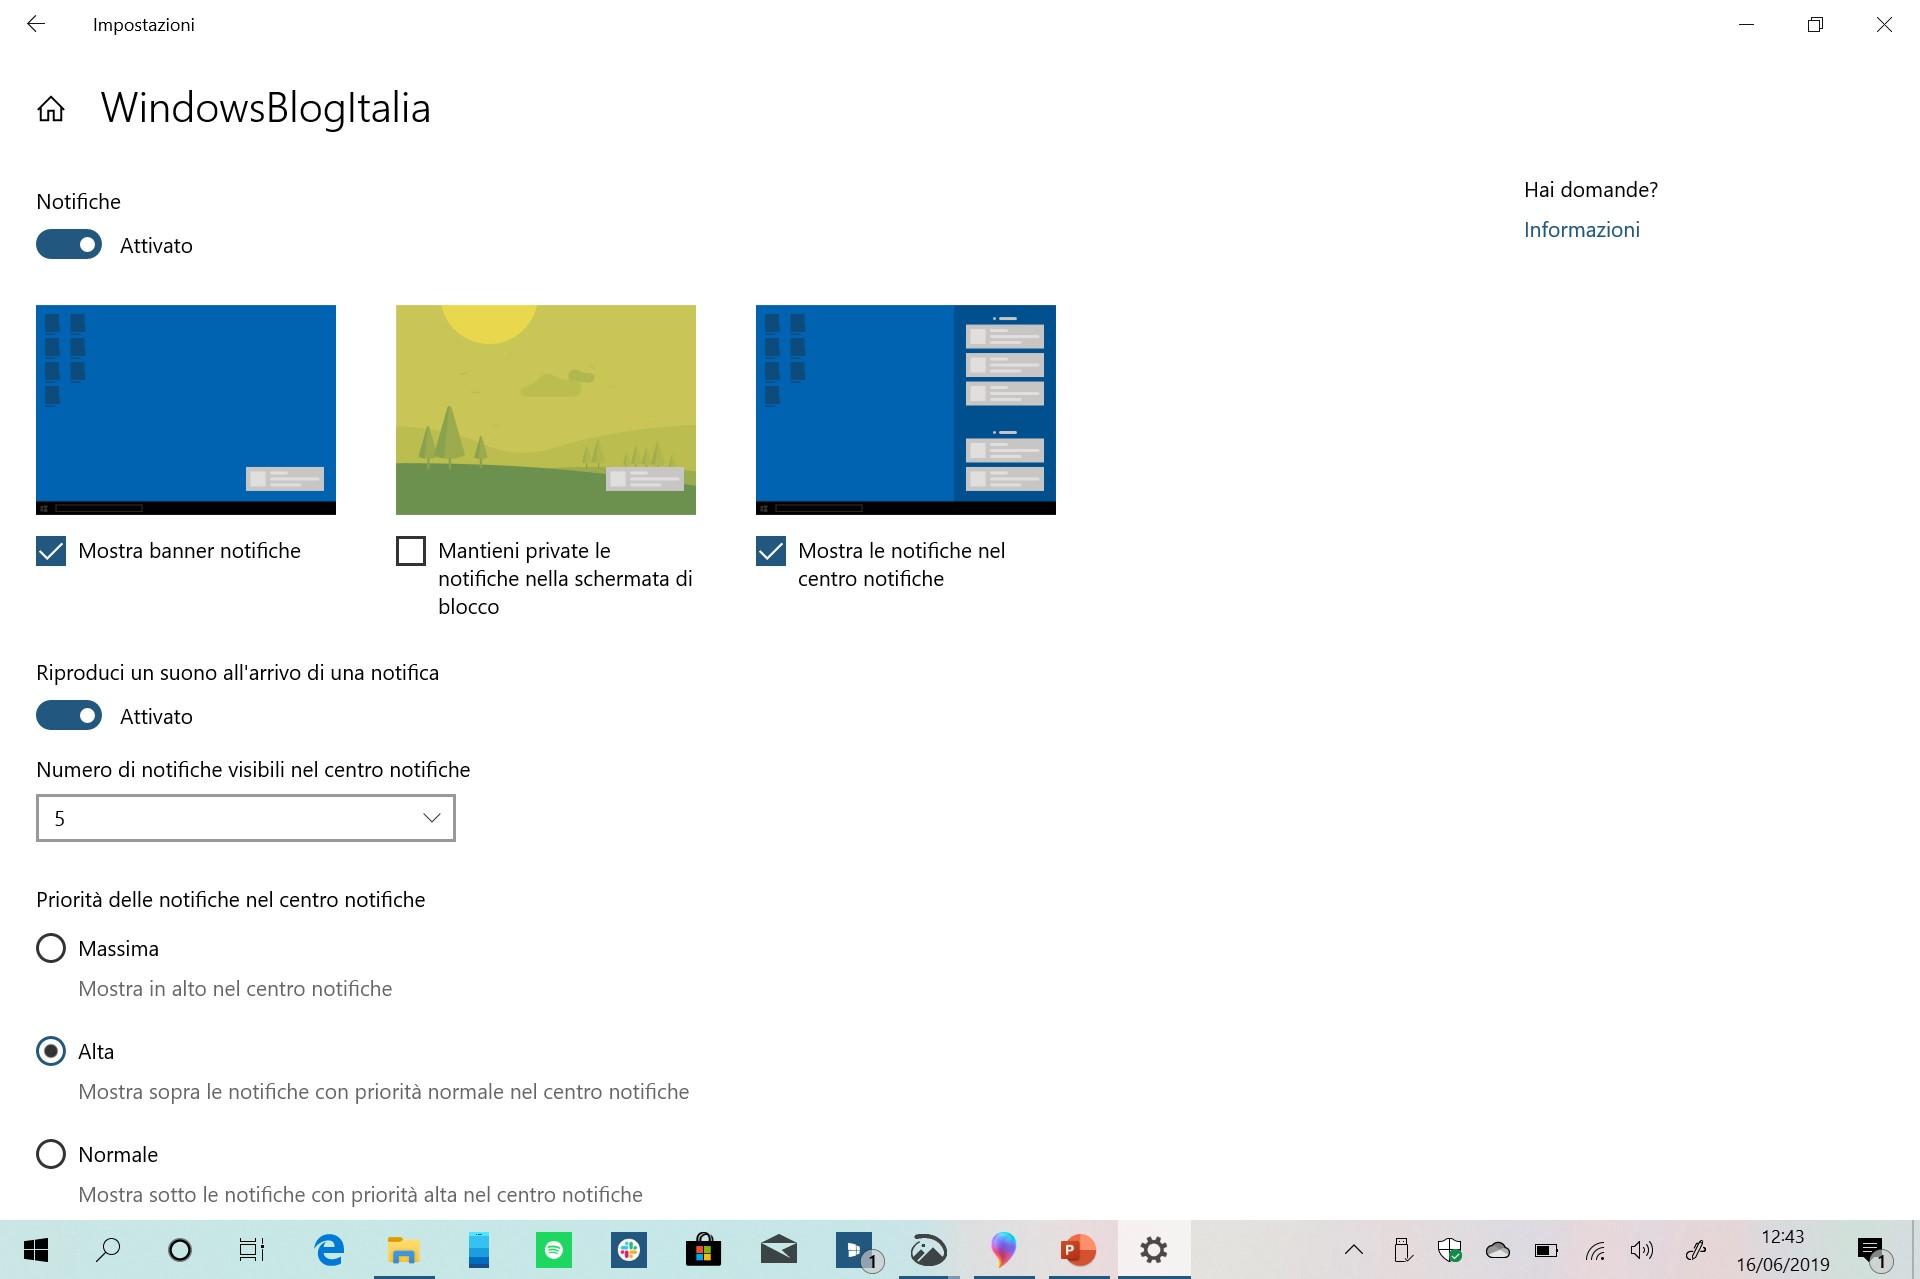 Nuovo menu gestione notifiche app Windows 10 20H1